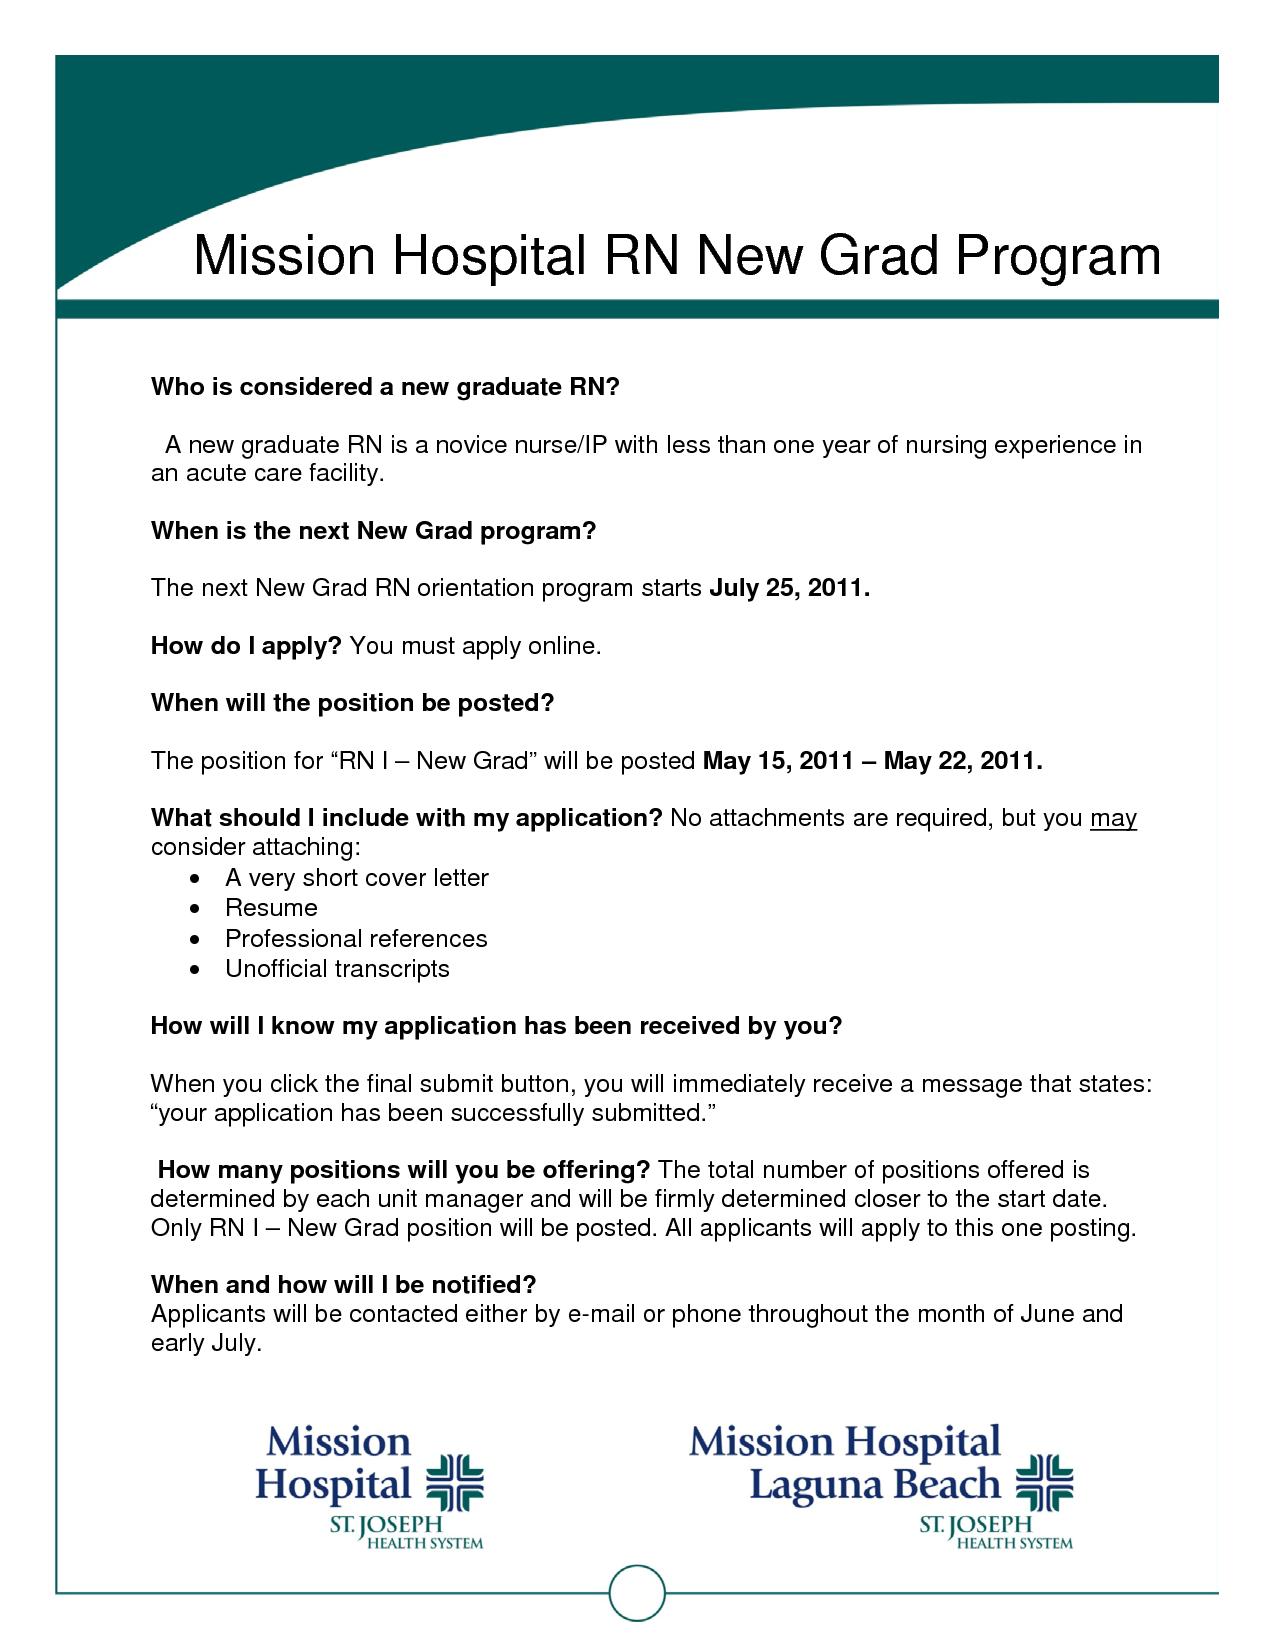 nurse graduate resumes